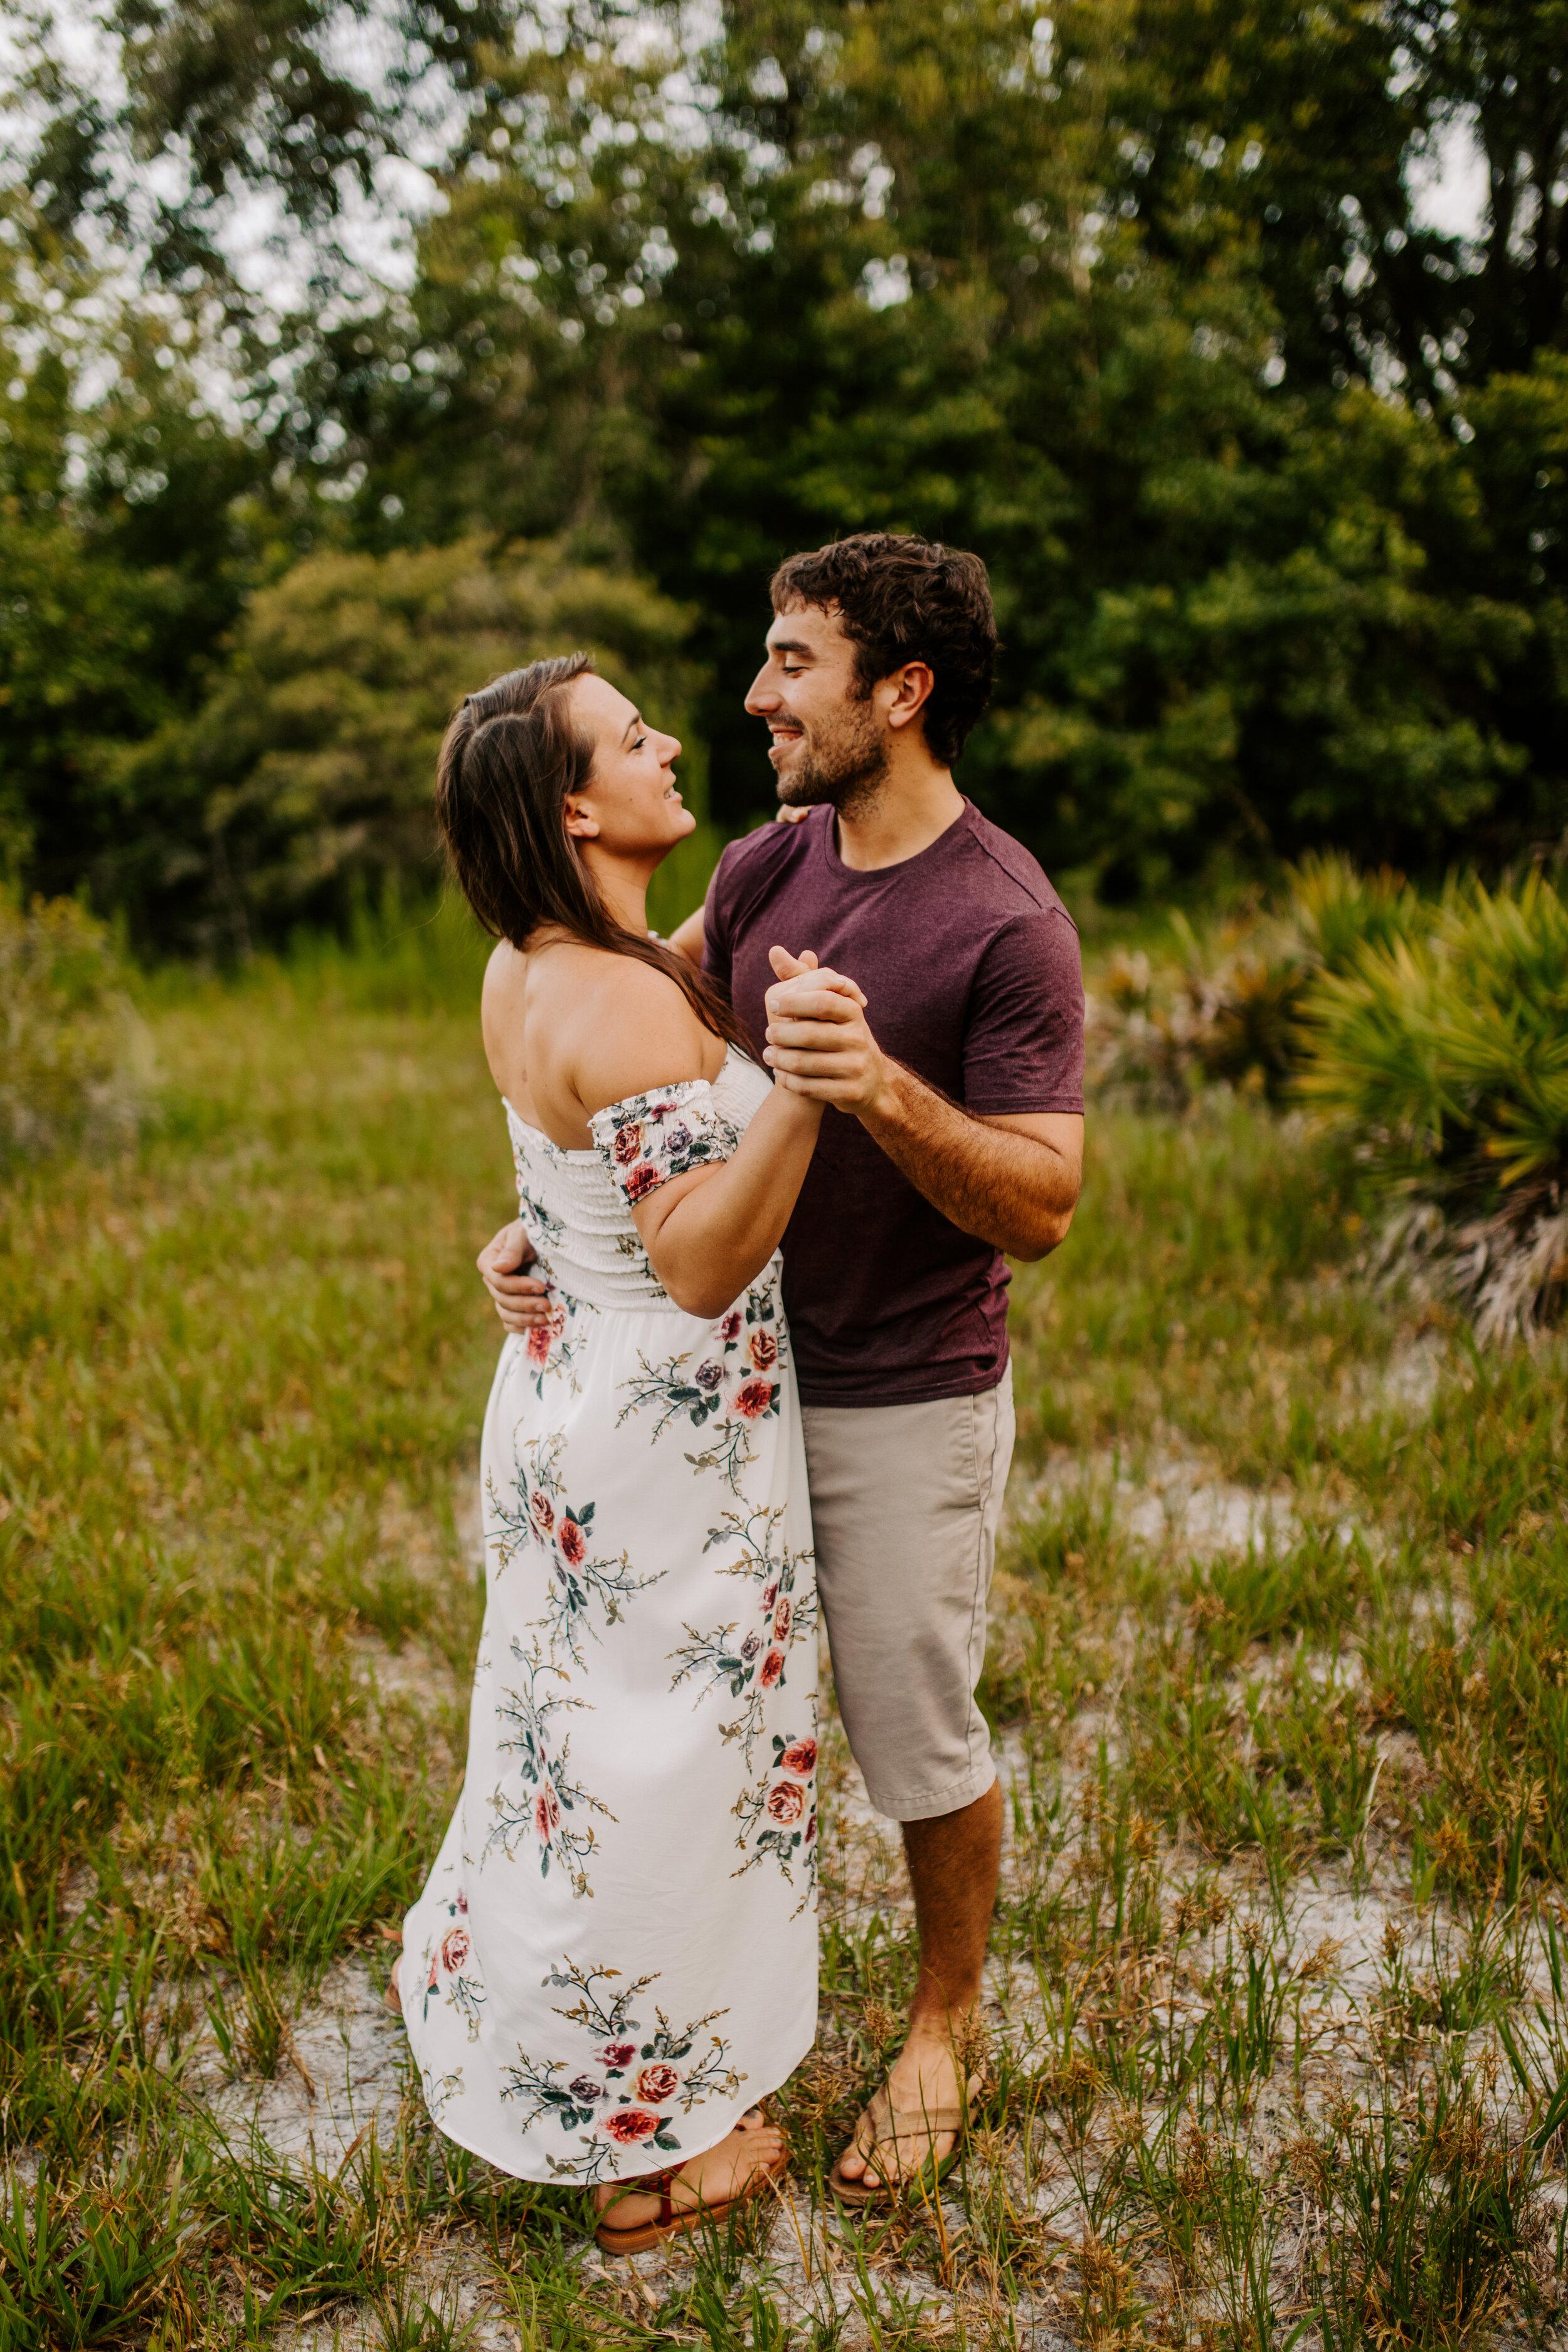 Jenna_+_Ryan_-_Native_Expressions_-_Florida_Engagement-125.jpg